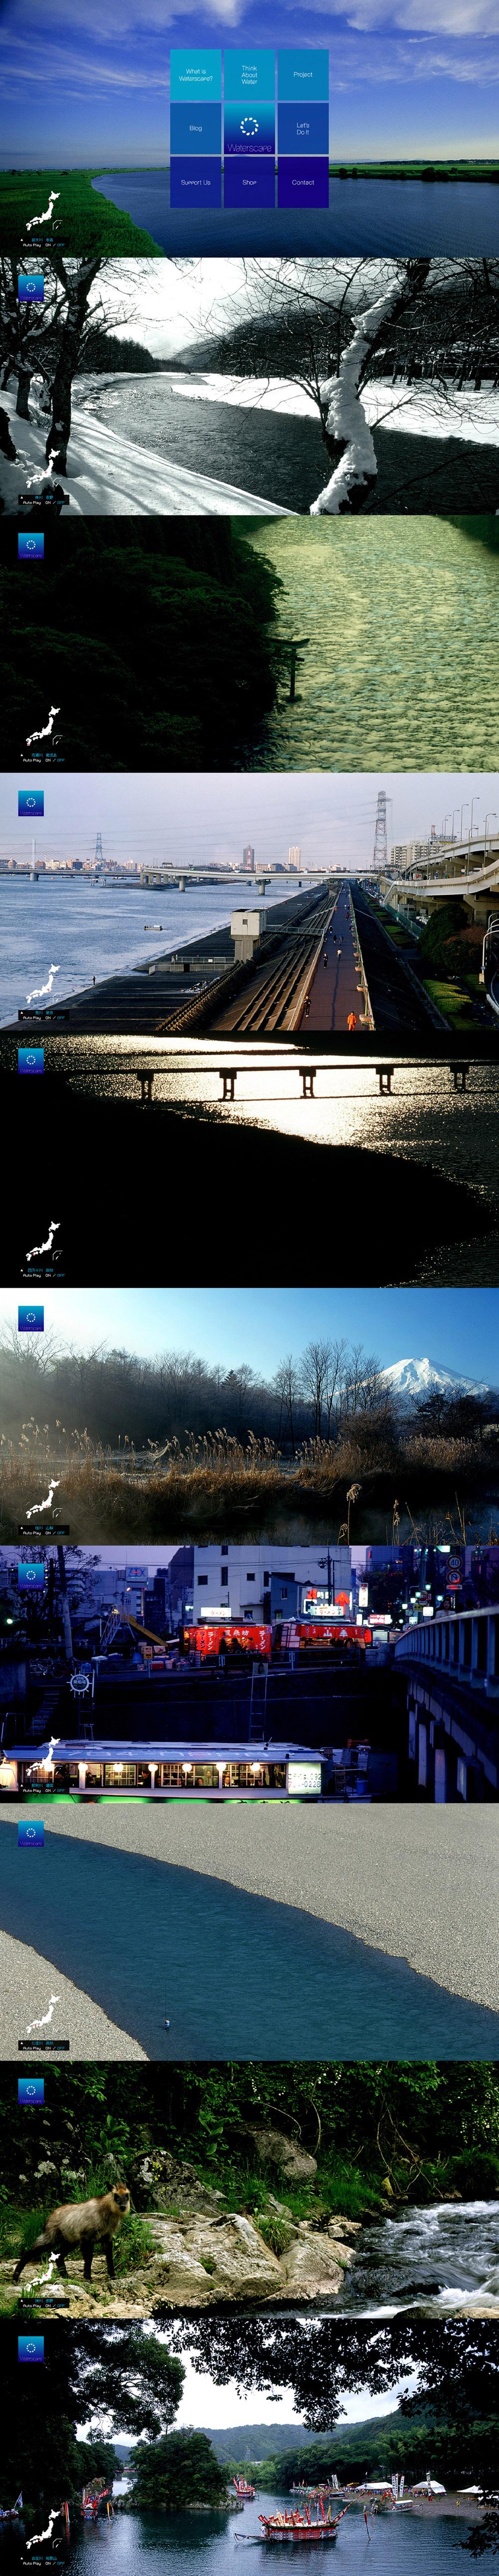 waterscape.jp